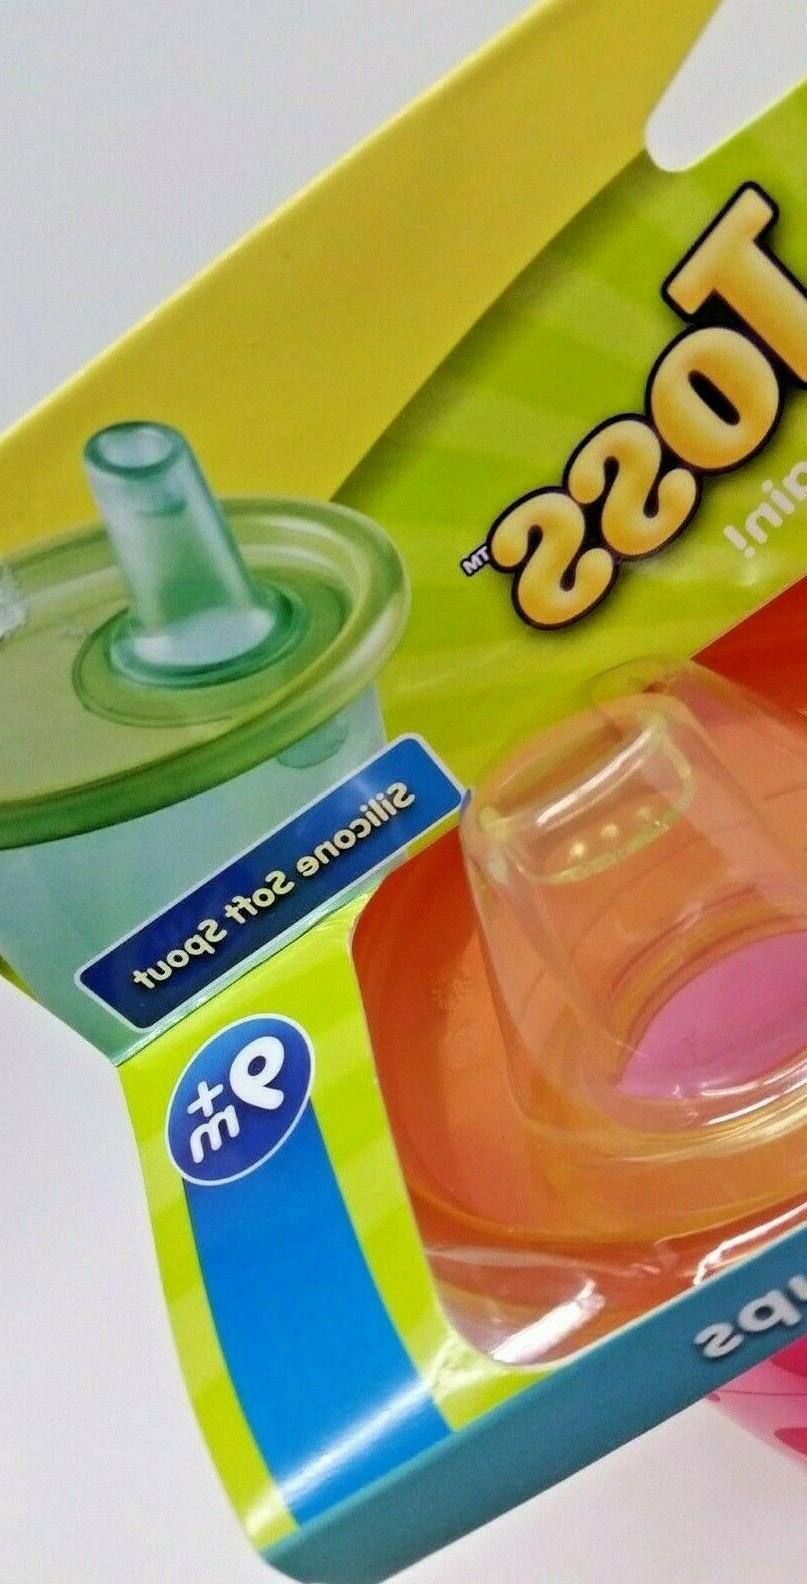 The First Spout 10 Oz Baby BRAND 9m+ BPA FREE